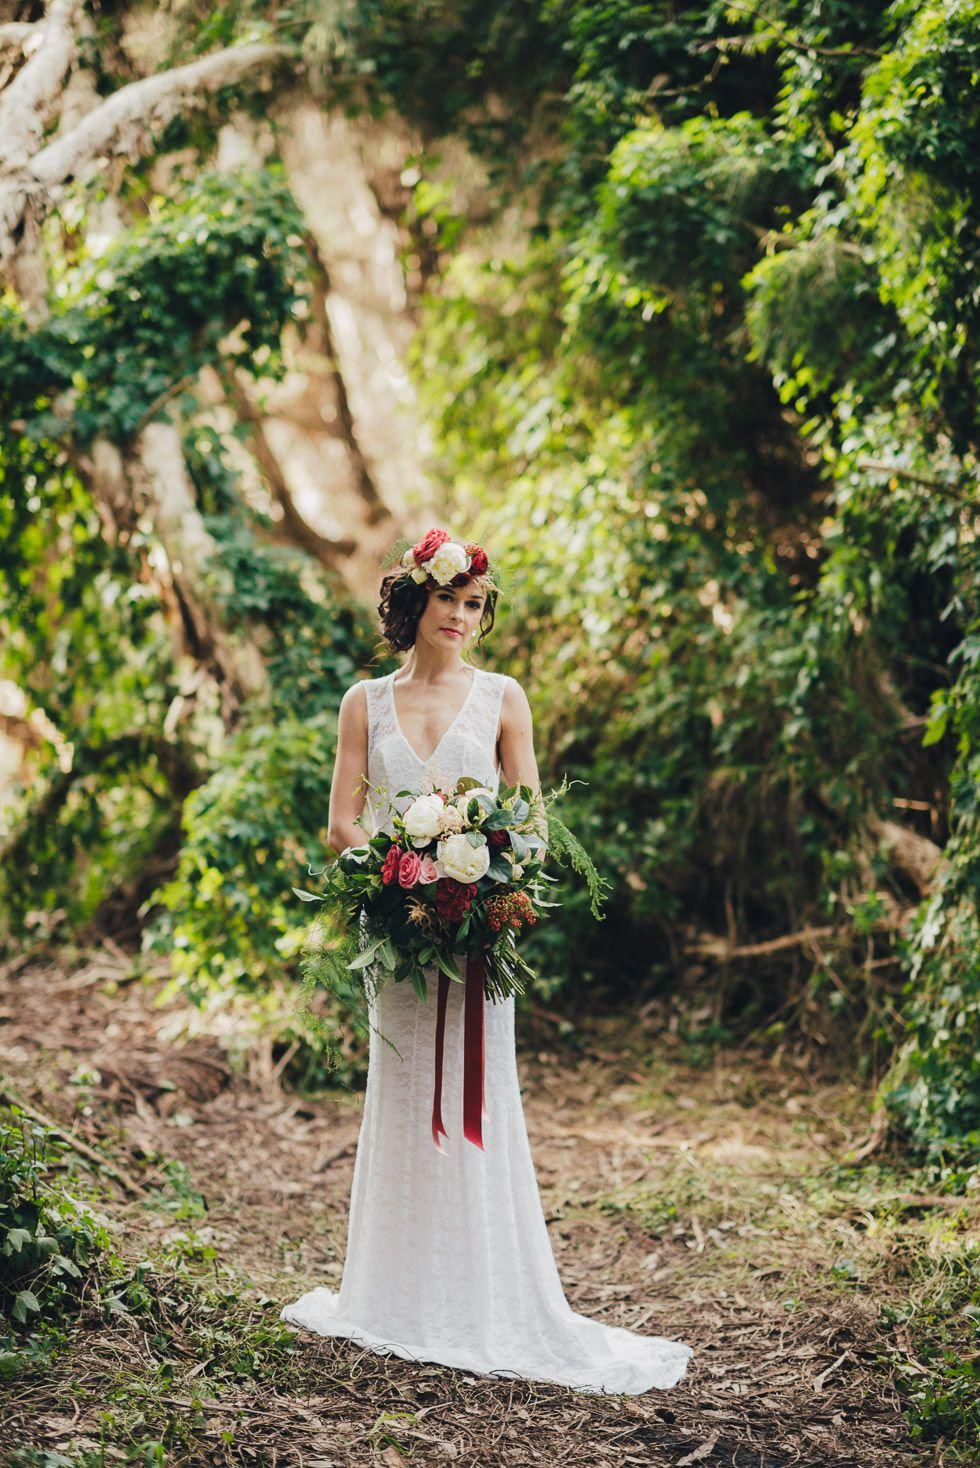 Beautiful bride portrait style shoot bridestory beautiful